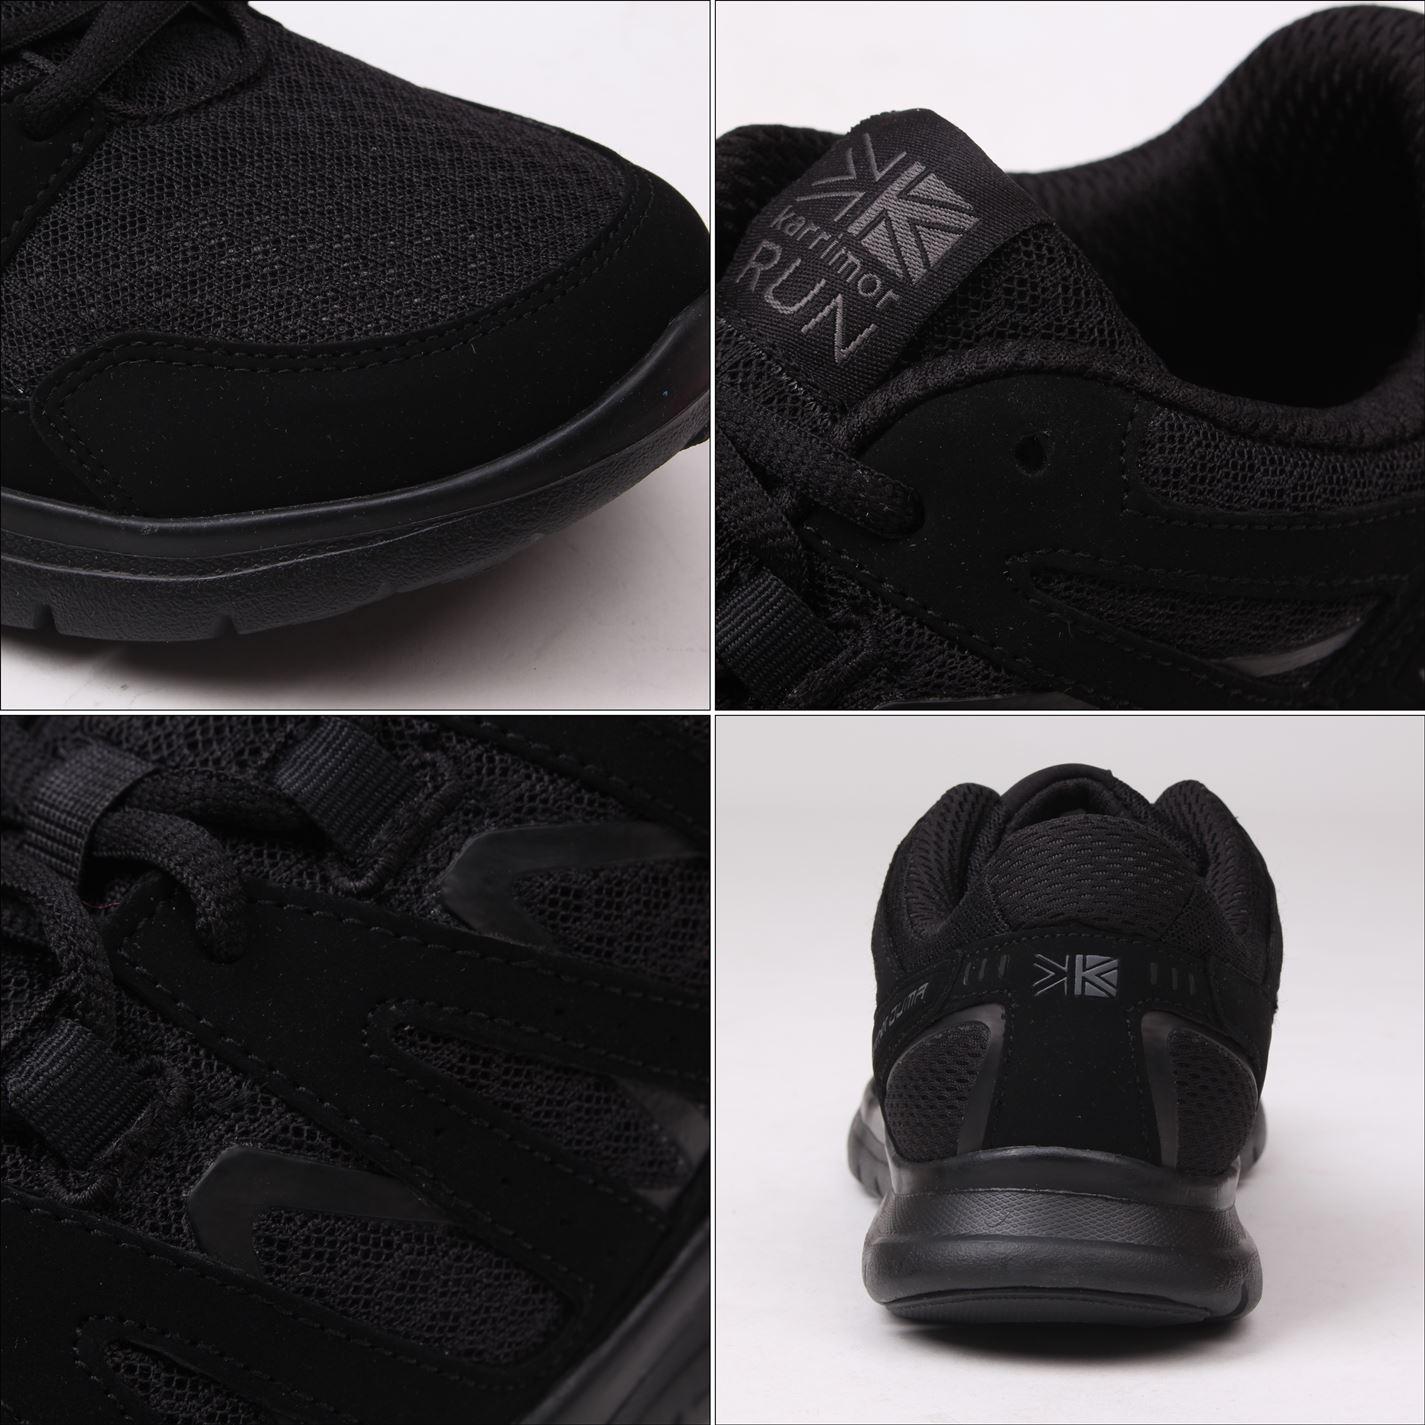 Karrimor-Mens-Duma-Trainers-Lace-Up-Sports-Running-Cross-Training-Shoes thumbnail 39